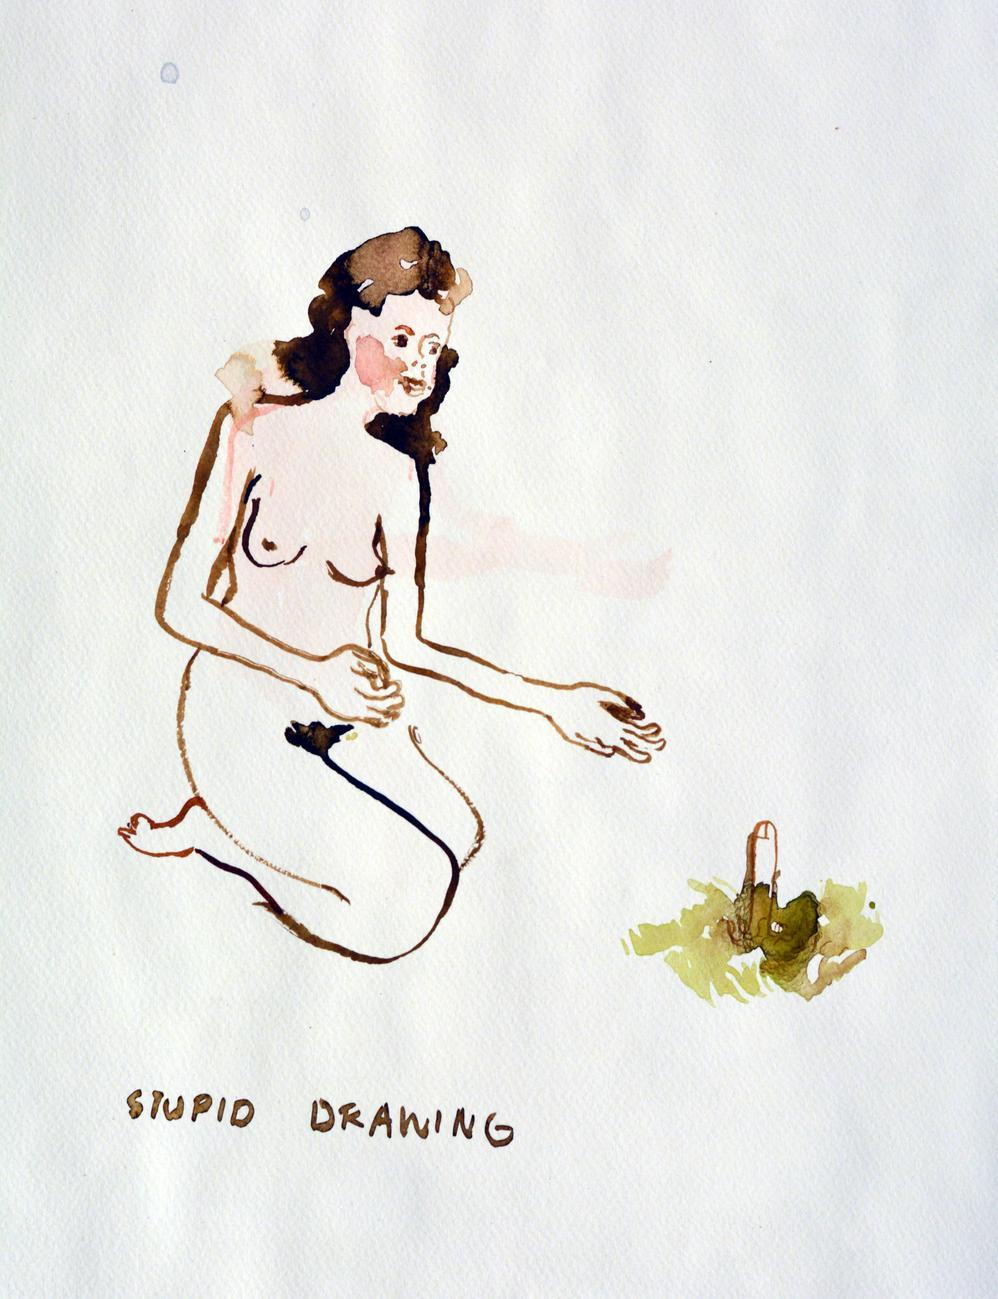 Stupid Drawing